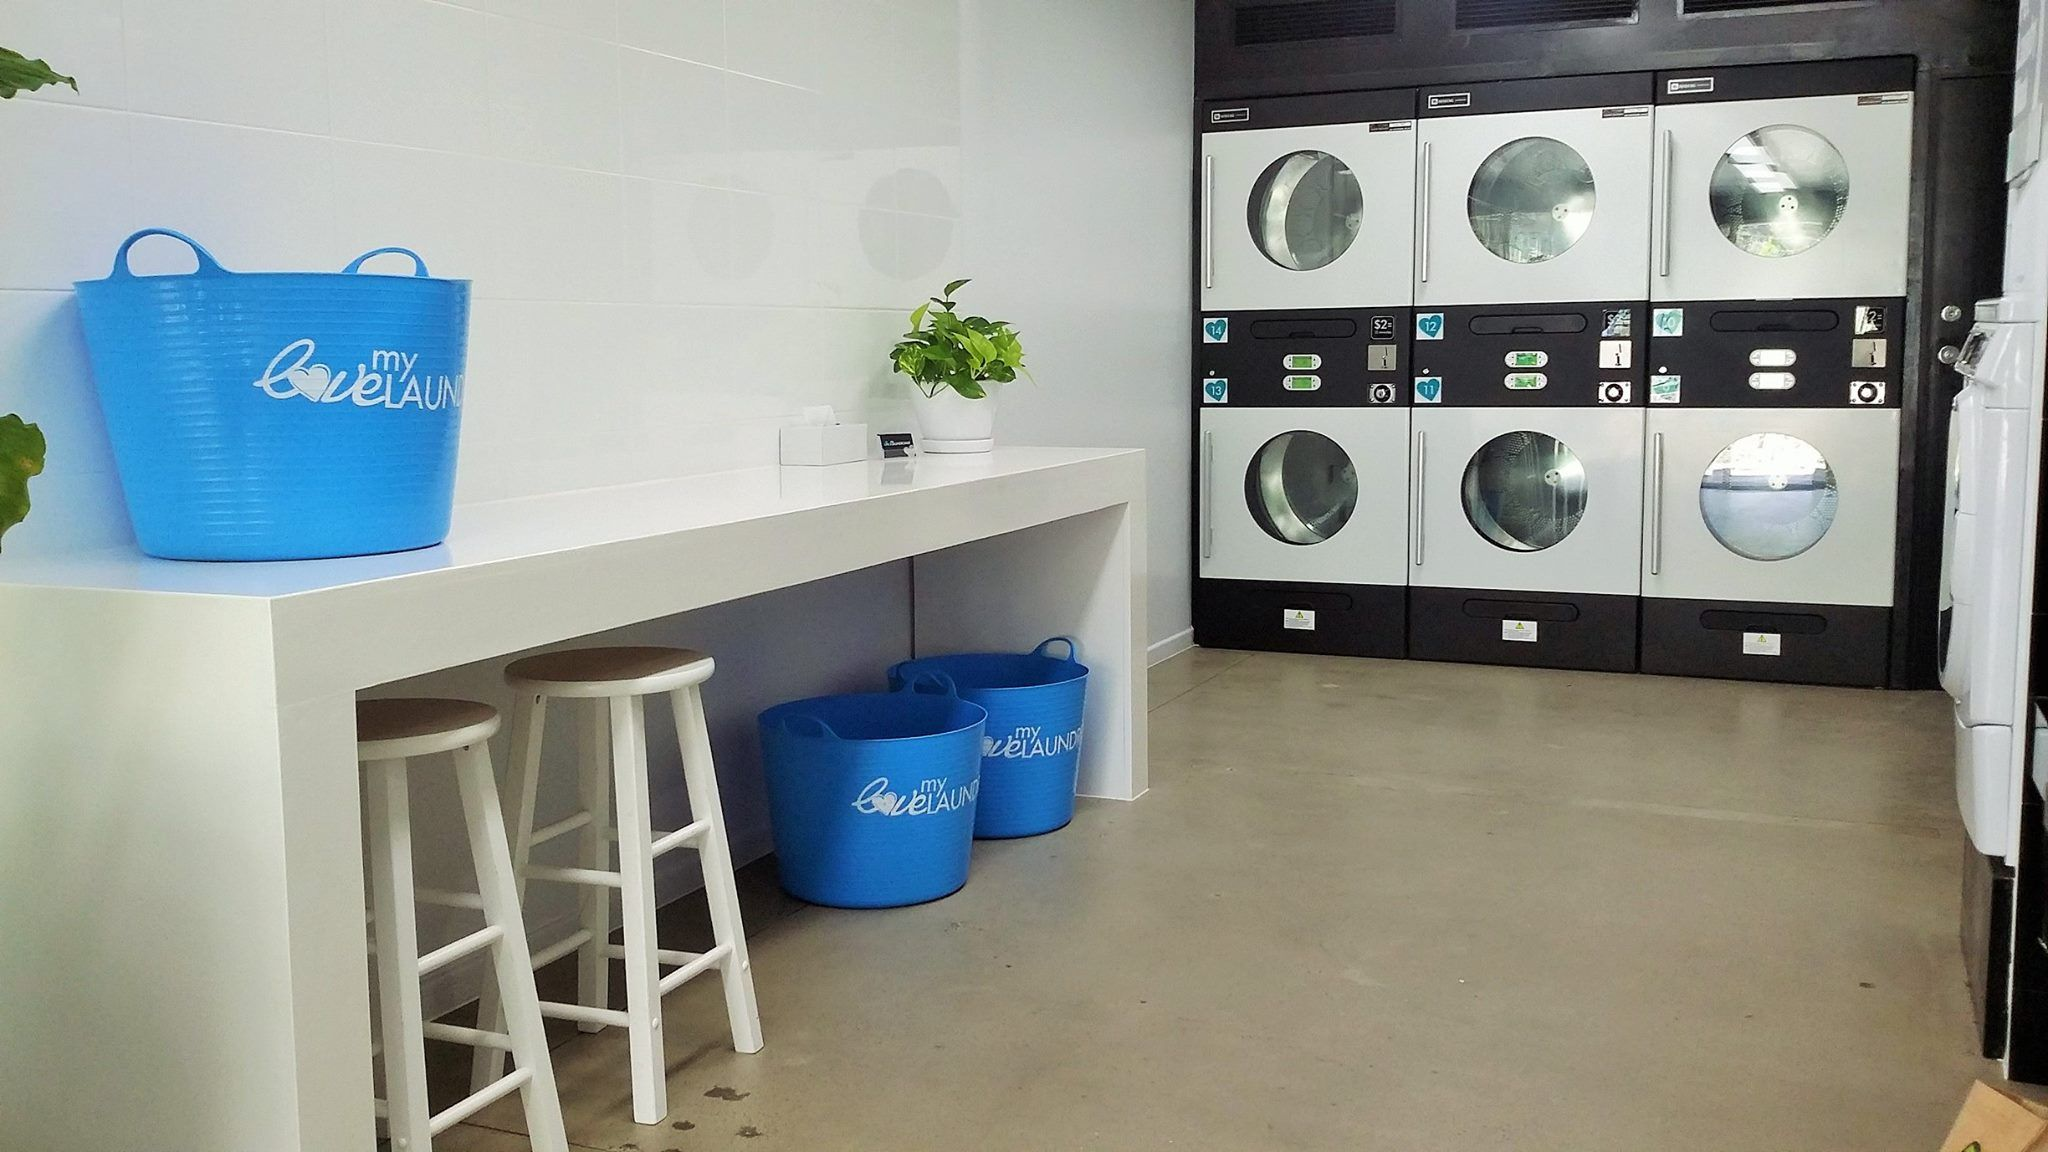 Pin By Maitham Rajab On Lavanderia Autoservicio Laundry Shop